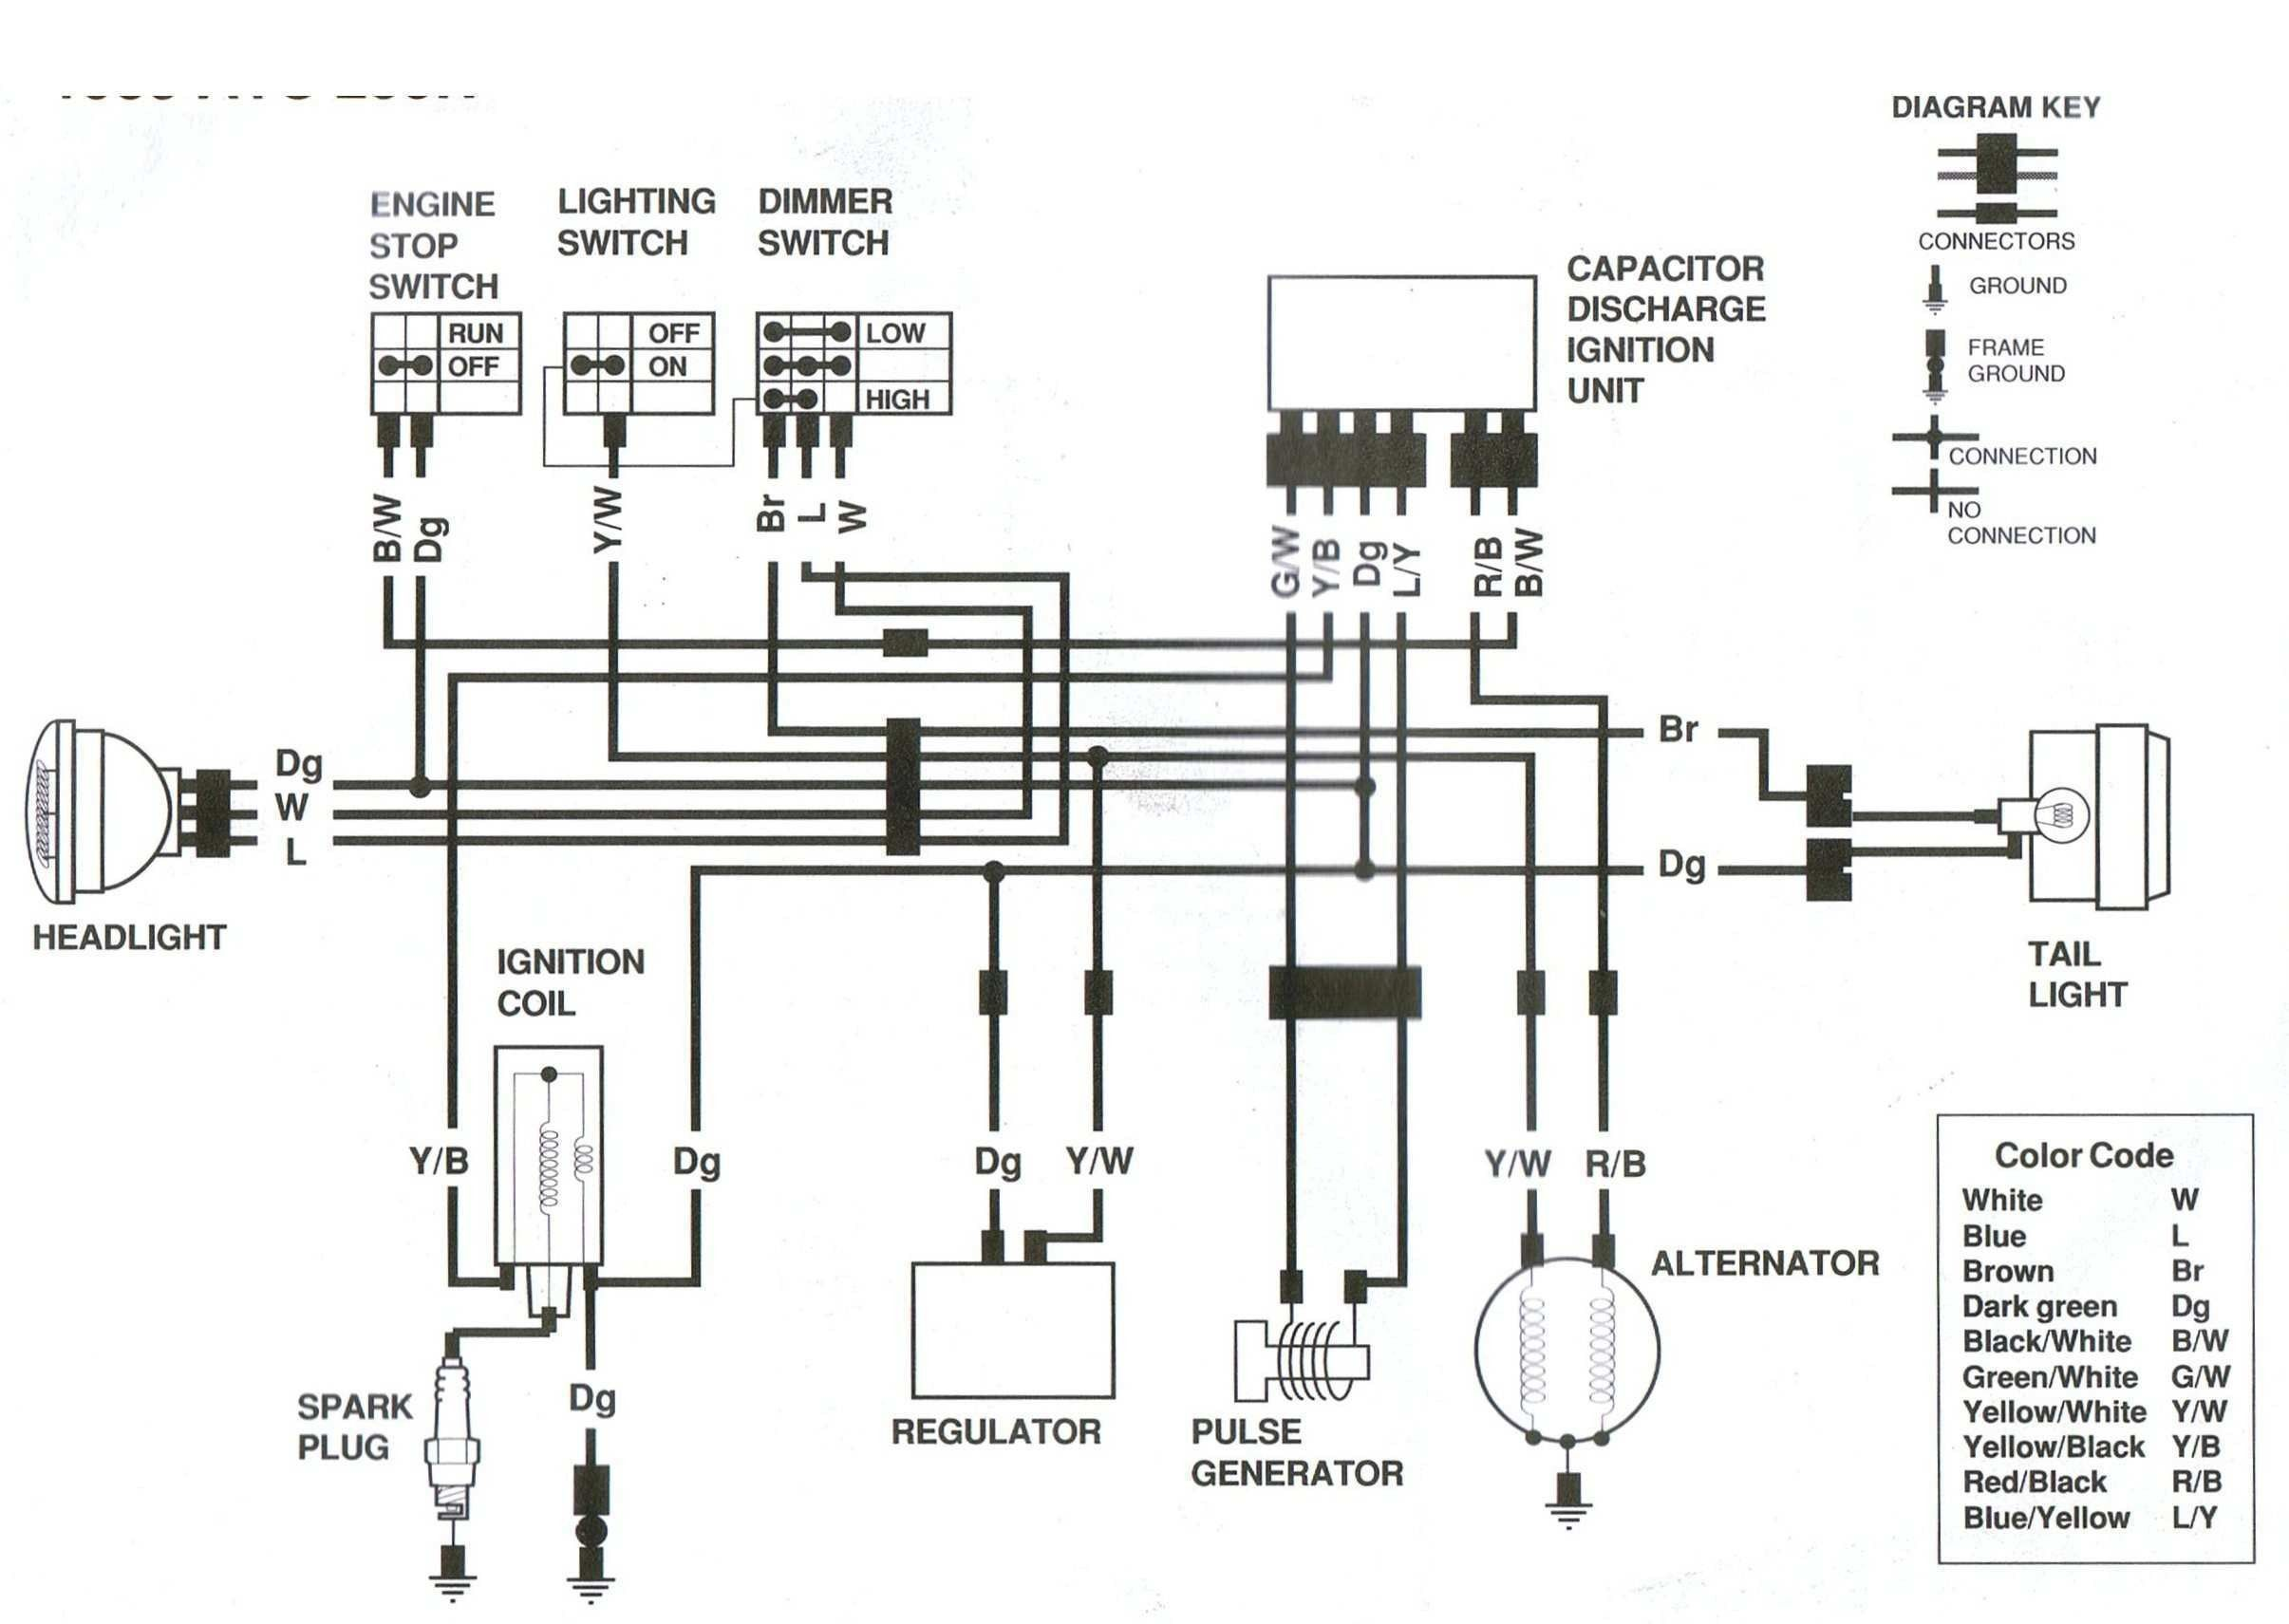 Inspirational Yamaha Banshee Wiring Diagram Electrical Wiring Diagram Motorcycle Wiring Diagram